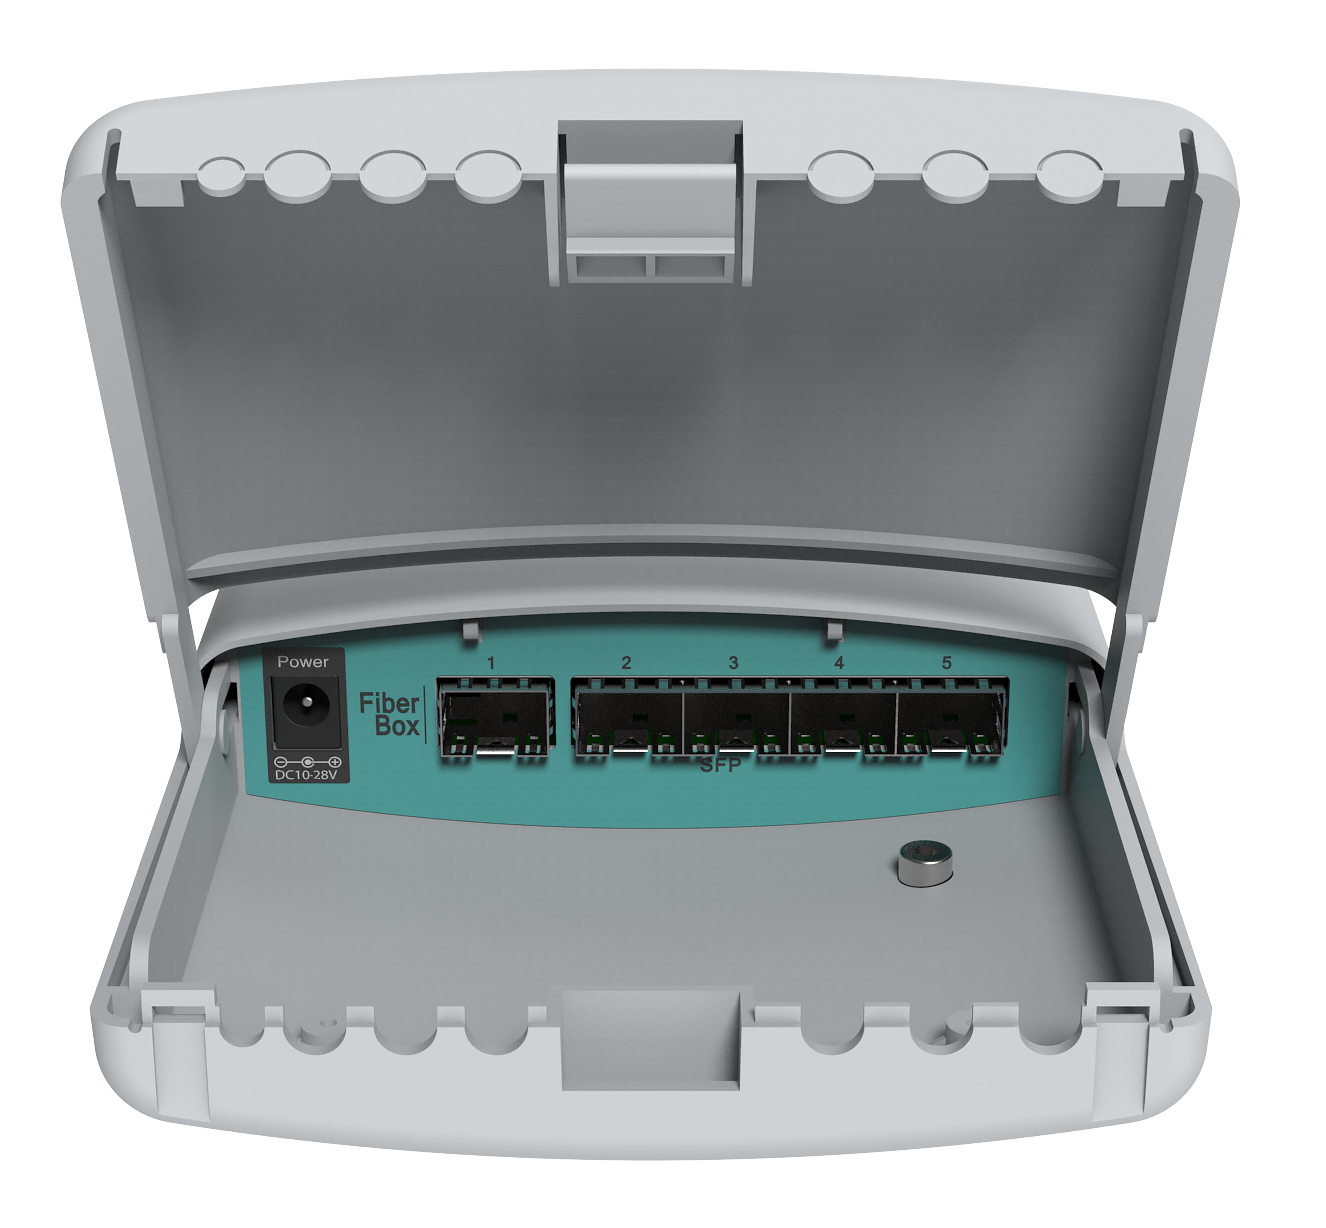 CRS105-5S-FB Cloud Router Switch CRS105-5S-FB Outdoor Layer3, 5x SFP Gigabit,L5